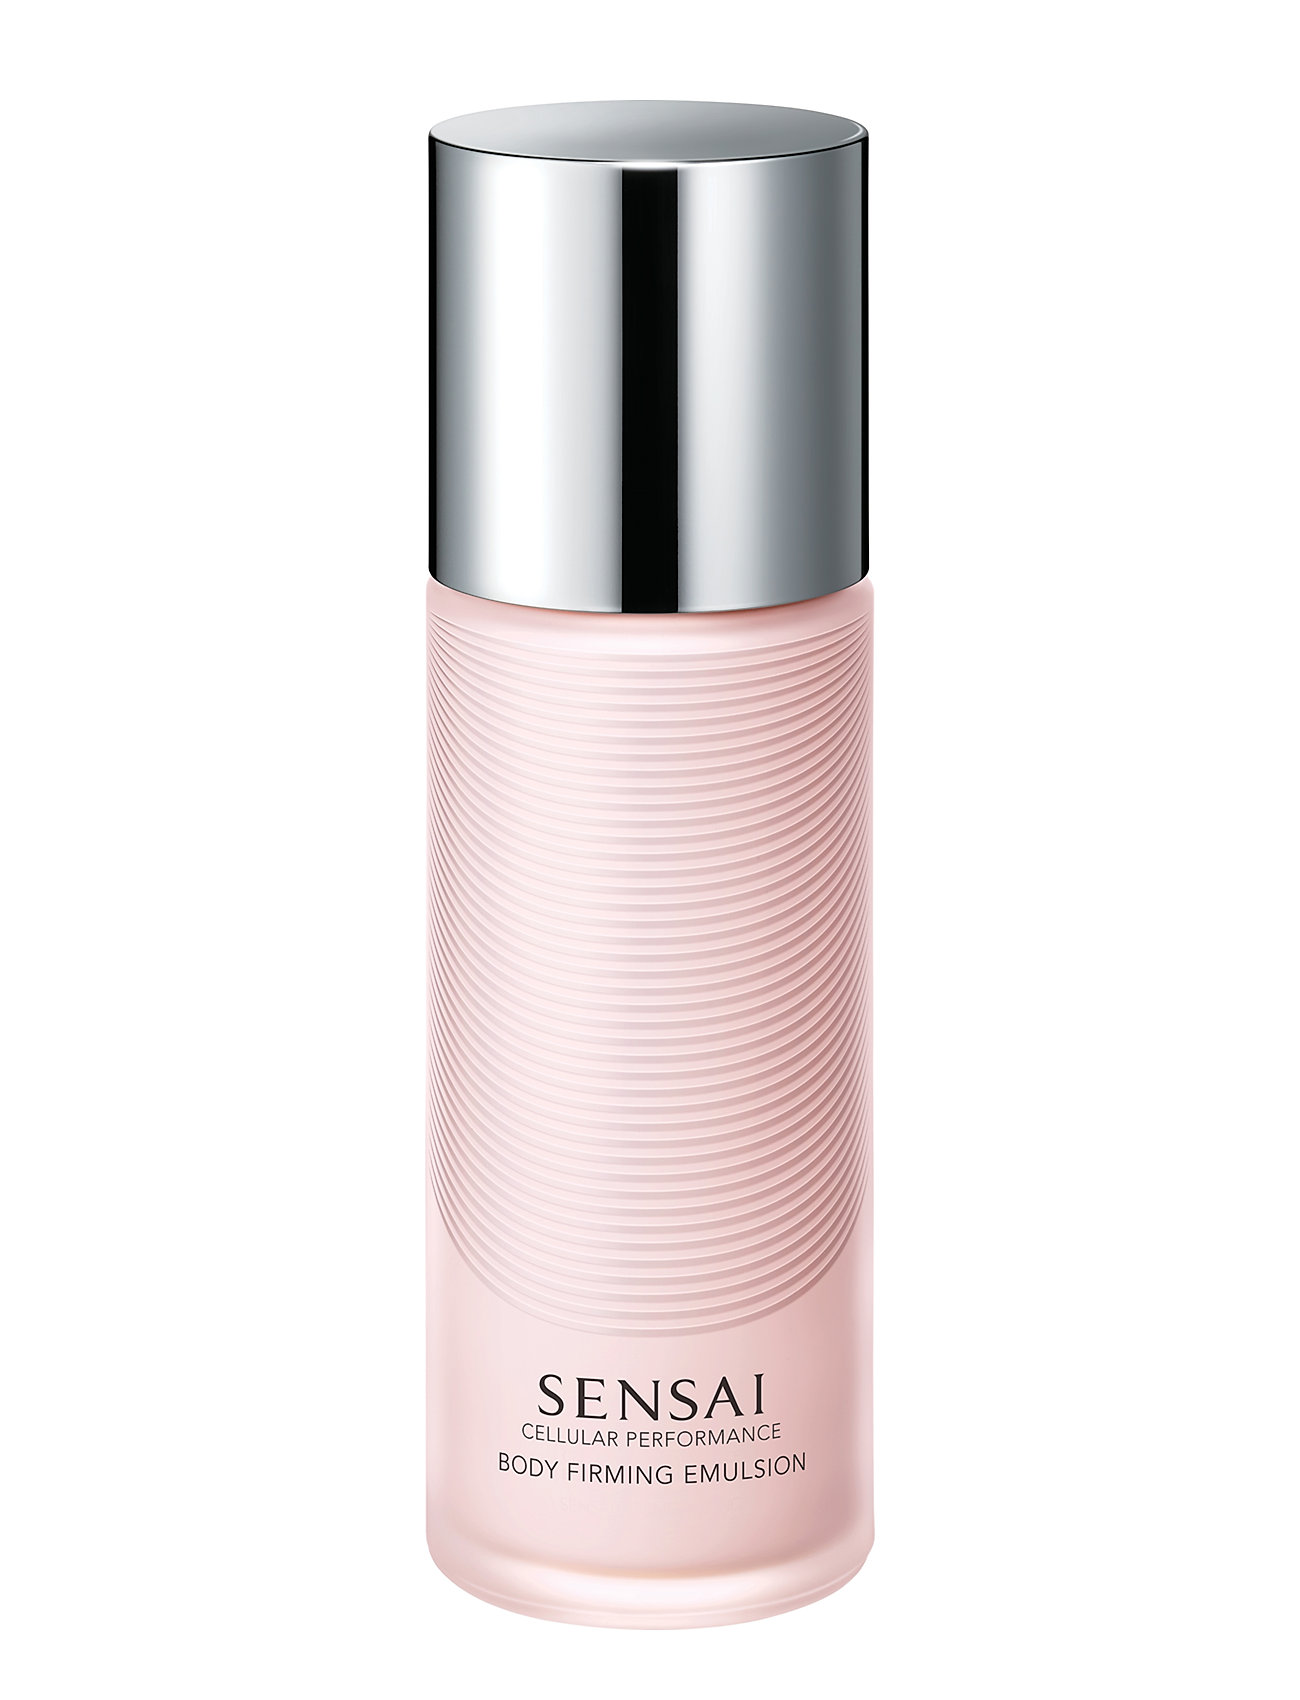 SENSAI Cellular Performance Body Firming Emulsion - NO COLOR